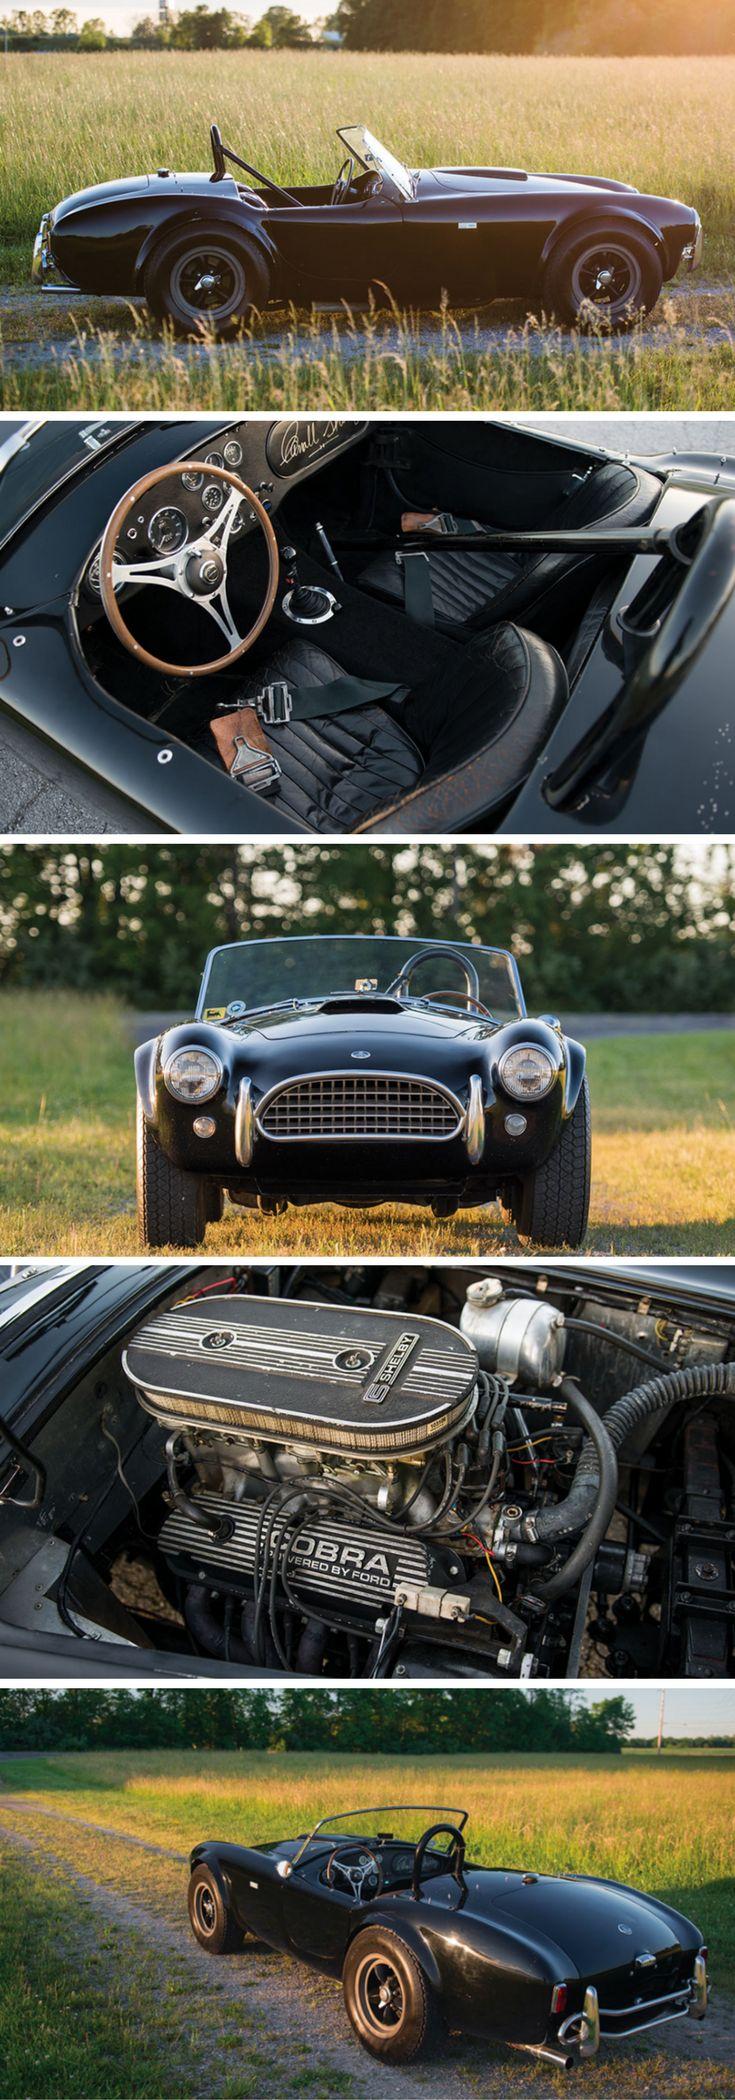 1963 Shelby 289 Cobra CXS 2075 https://www.amazon.co.uk/Baby-Car-Mirror-Shatterproof-Installation/dp/B06XHG6SSY